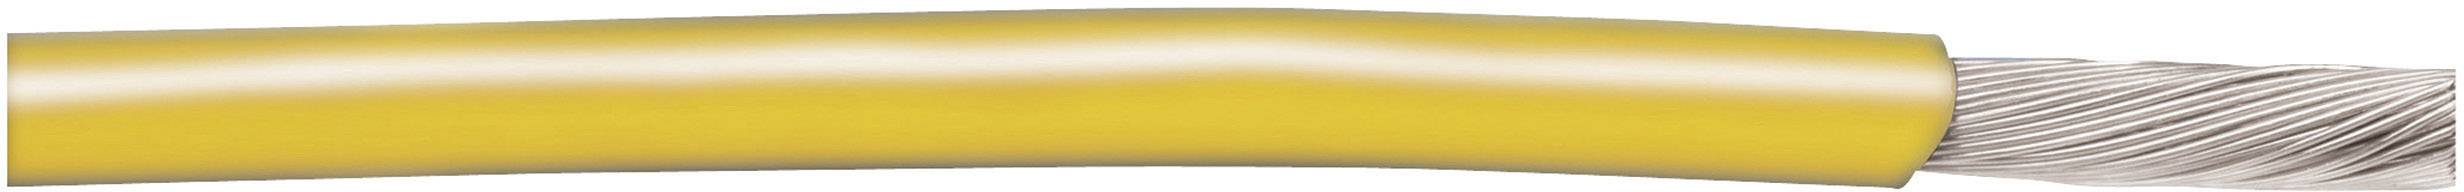 Pletenica 1 x 0.22 mm, rumena AlphaWire 3070 YL001 cena za meter